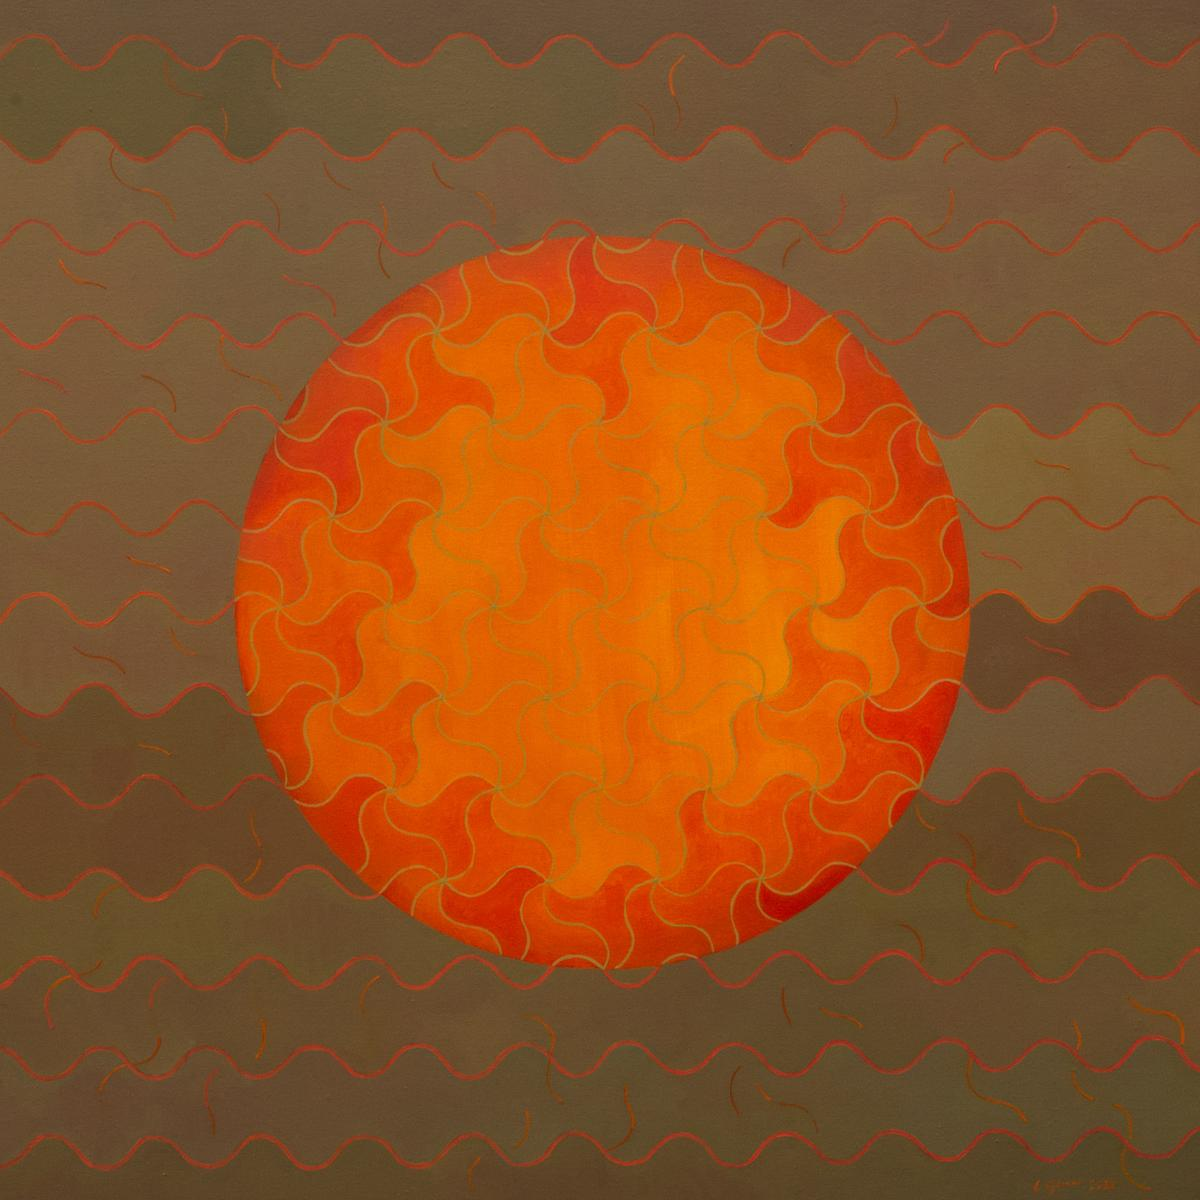 Marmelade Sky, L Glover, 2020